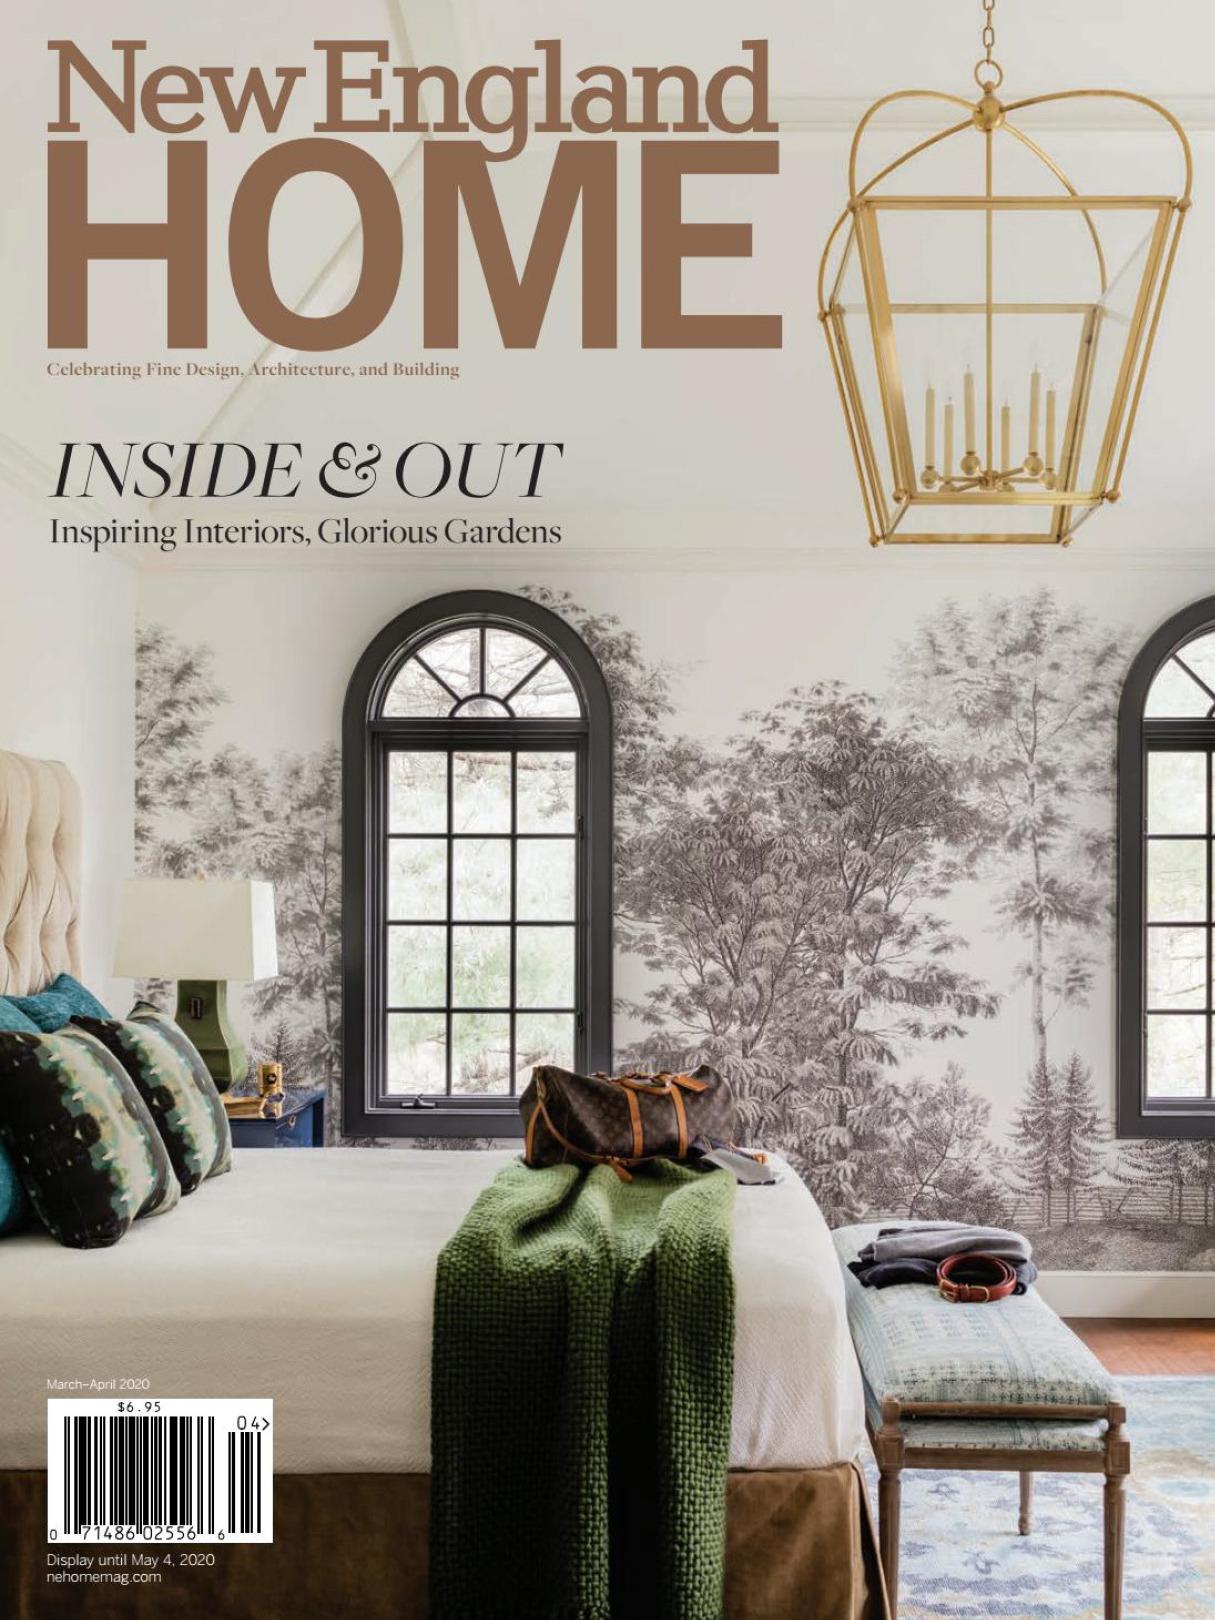 《New England Home》美国室内时尚杂志2020年03-04月号